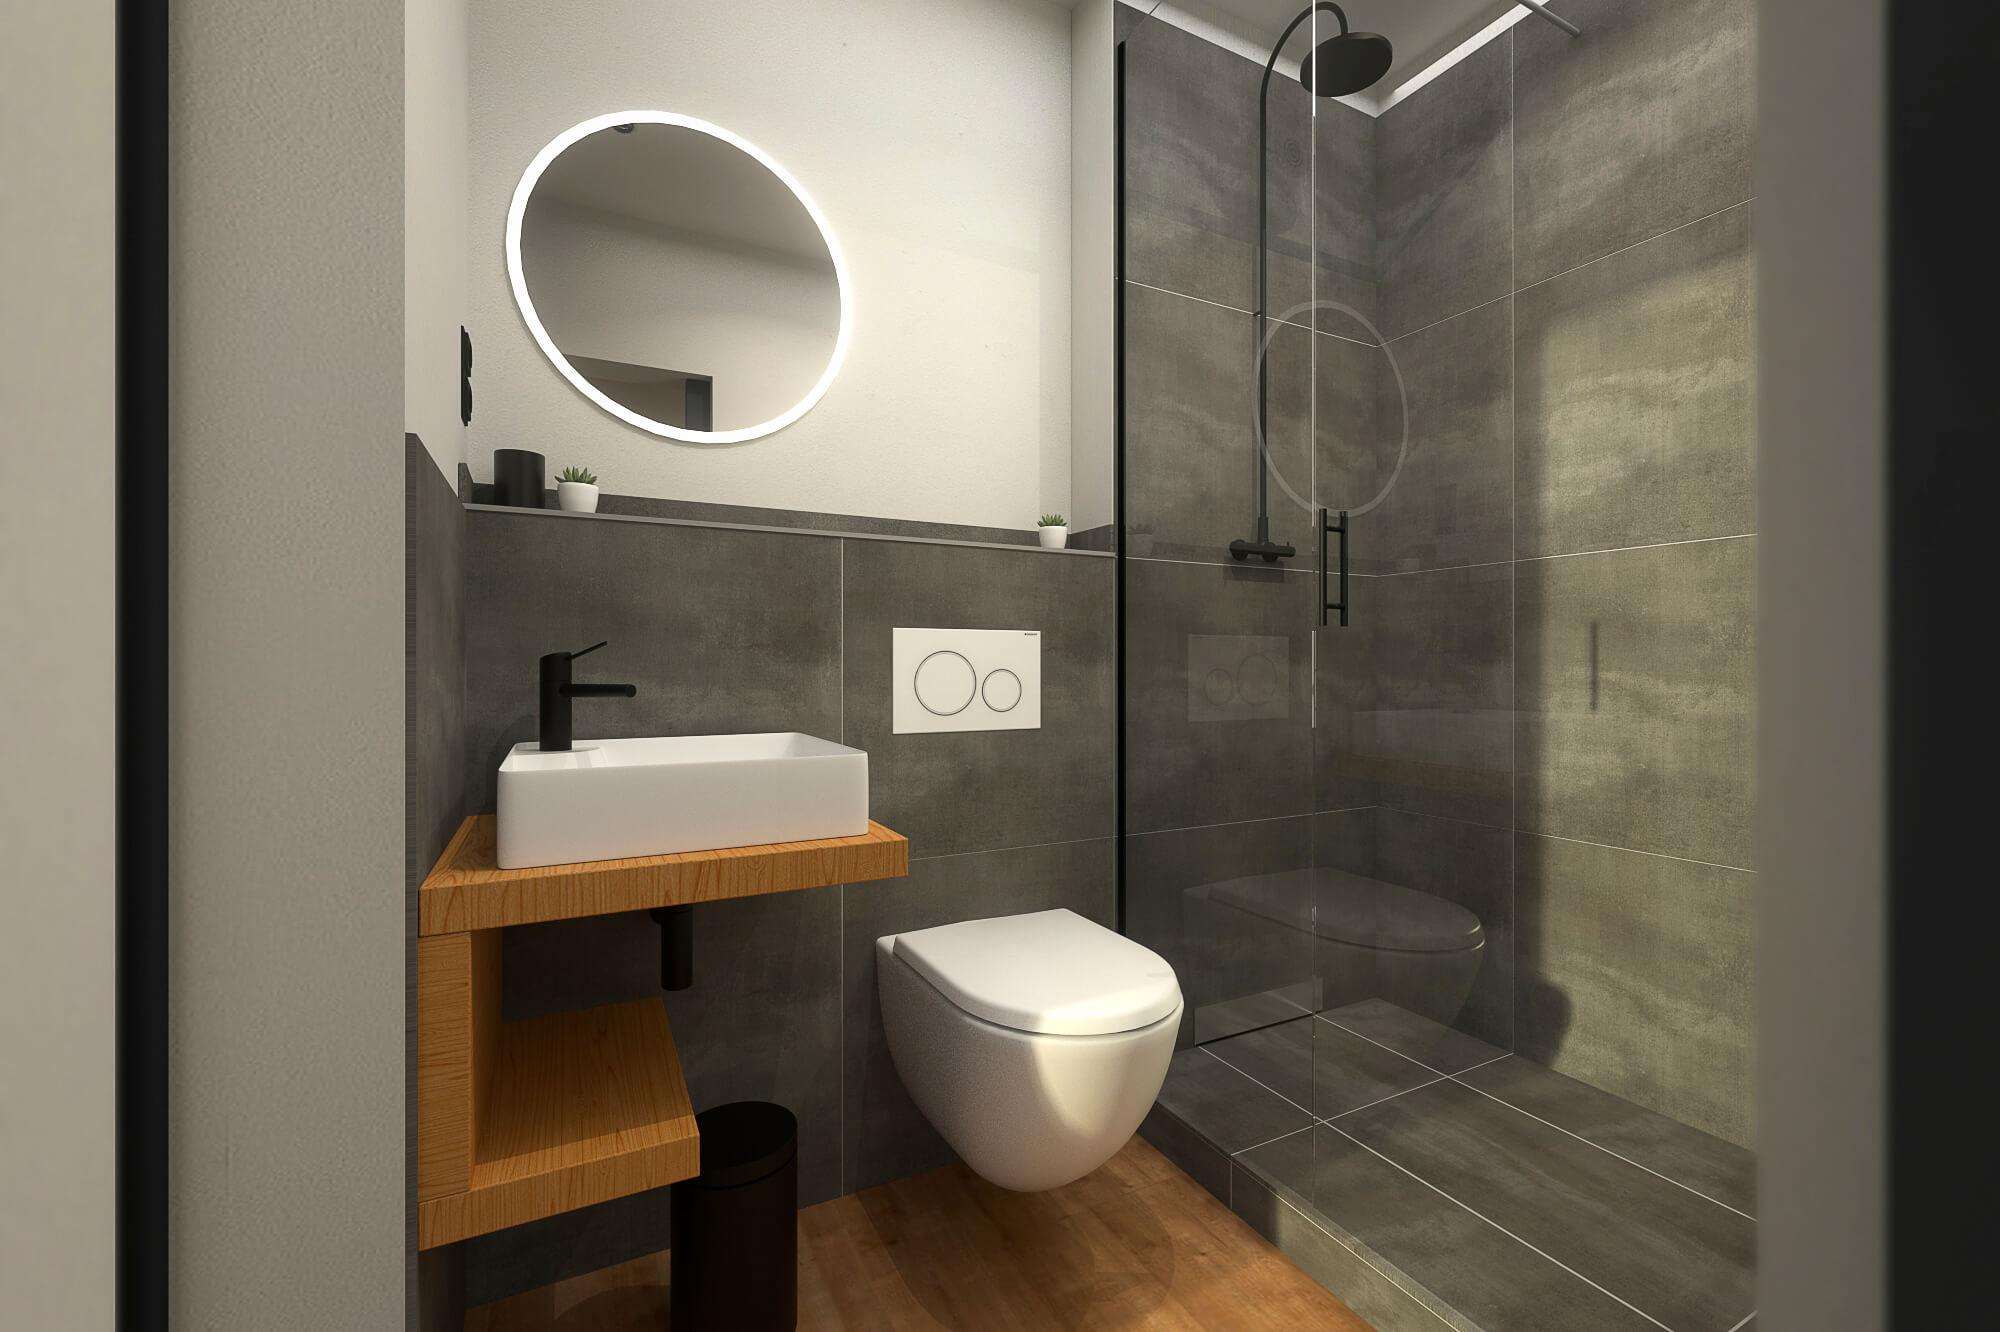 Tiny House BLOXS Badezimmer mit begehbarer Dusche